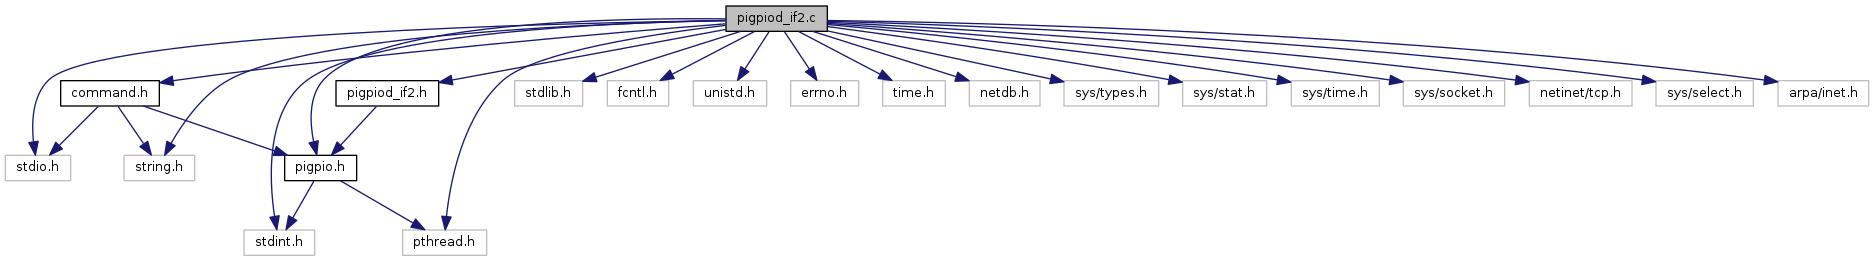 cob_hand_bridge: pigpiod_if2 c File Reference